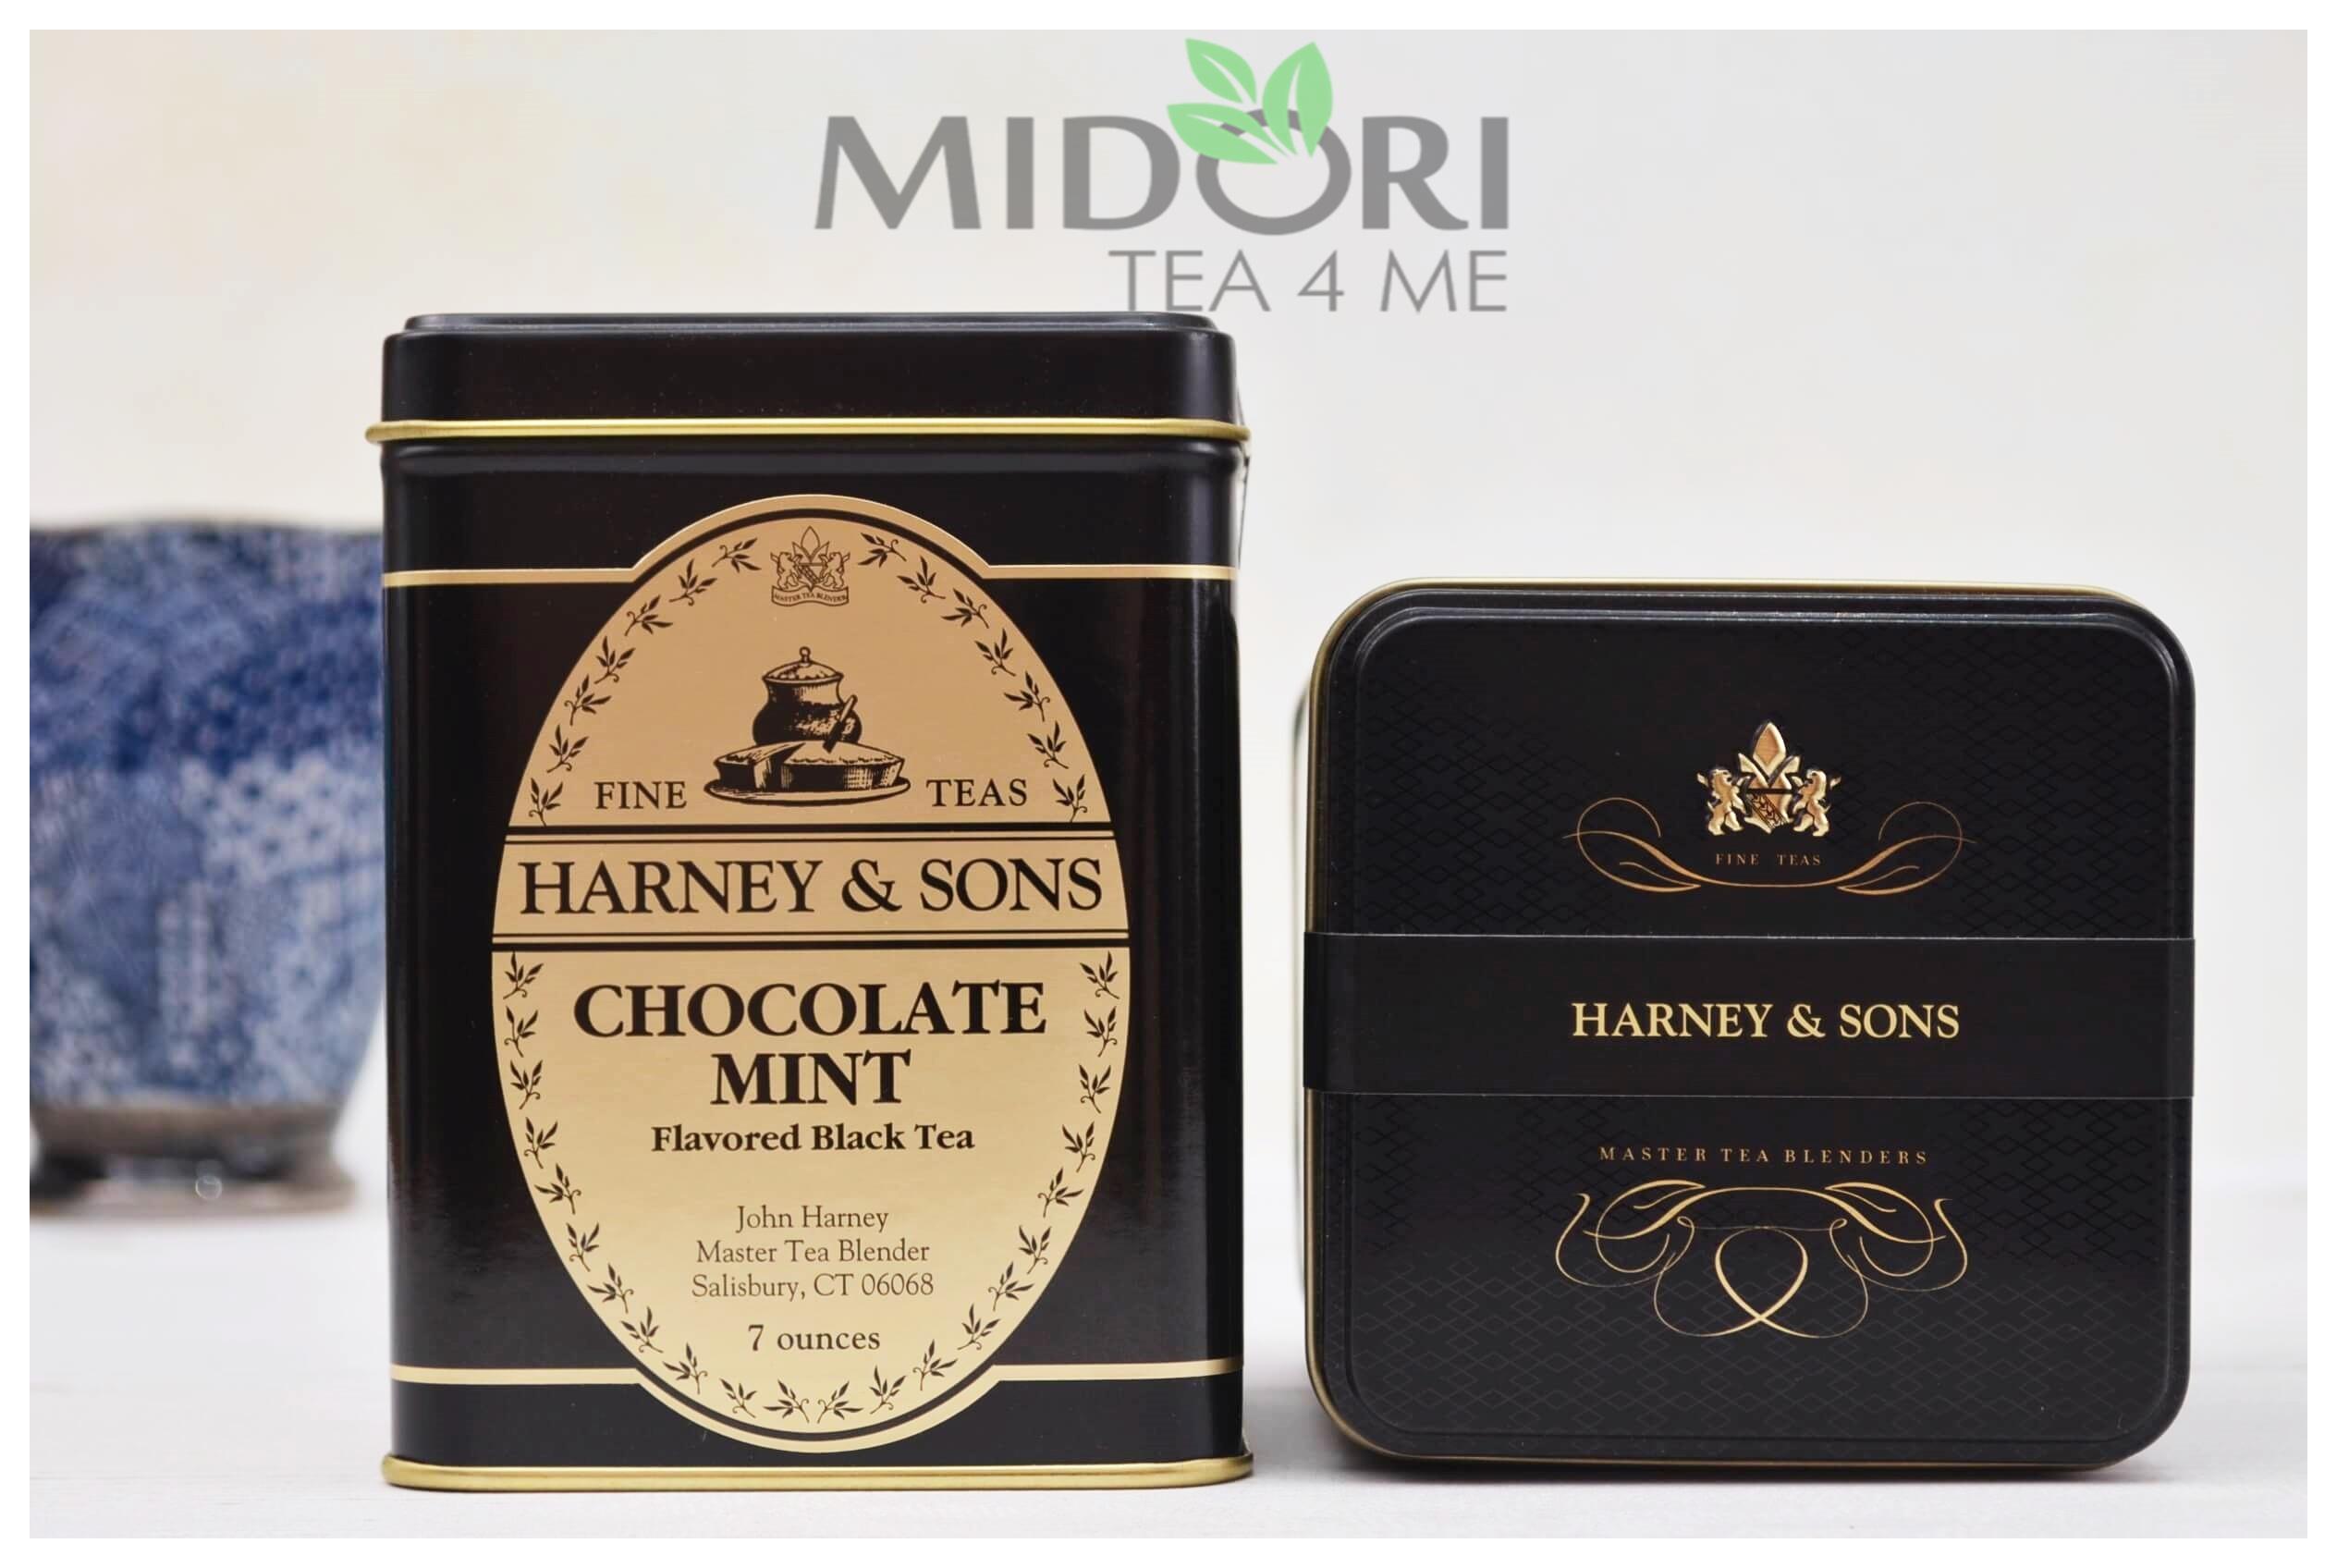 chocolate mint, herbata czekoladowa, herbata czekoladowo-miętowa